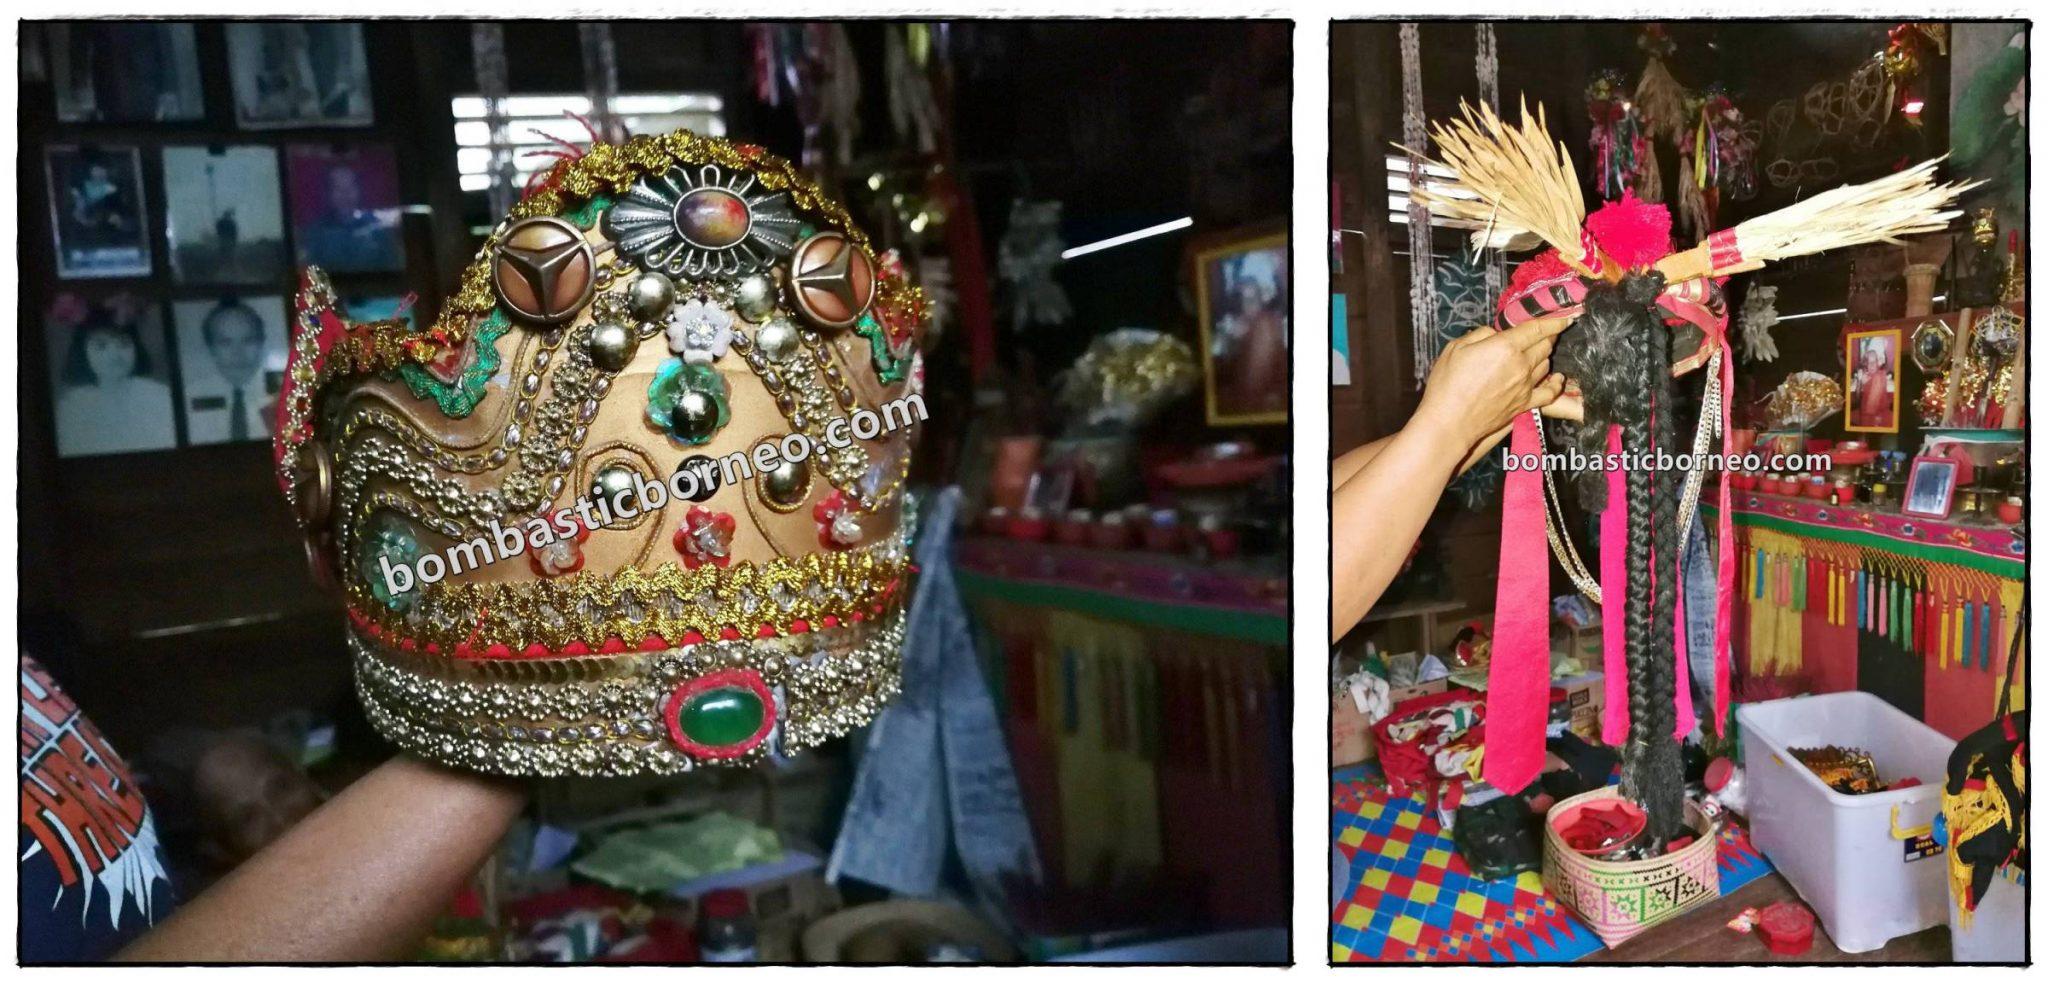 Panglima Siru, Dukun, Sifu, Sufu, healer, dayak, native, Kalimantan Barat, Dusun Paling Dalam, Sango, Travel, village, Cross Border, 探索婆罗洲游踪, 印尼西加里曼丹, 原住民达雅祭司